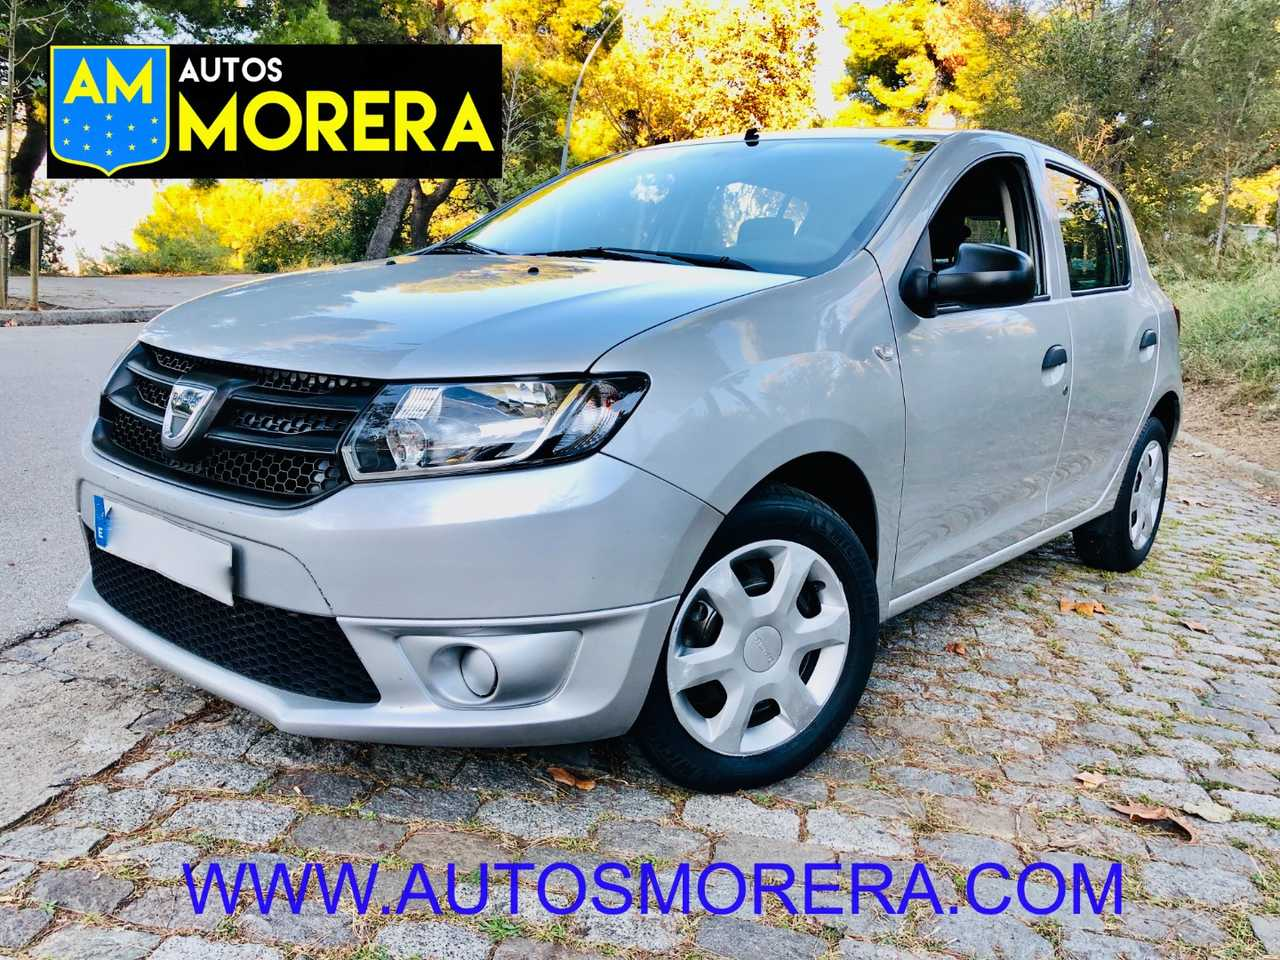 Dacia Sandero 1.5 dCi Ambiance 75cv. Impecable . Perfecto.   - Foto 1